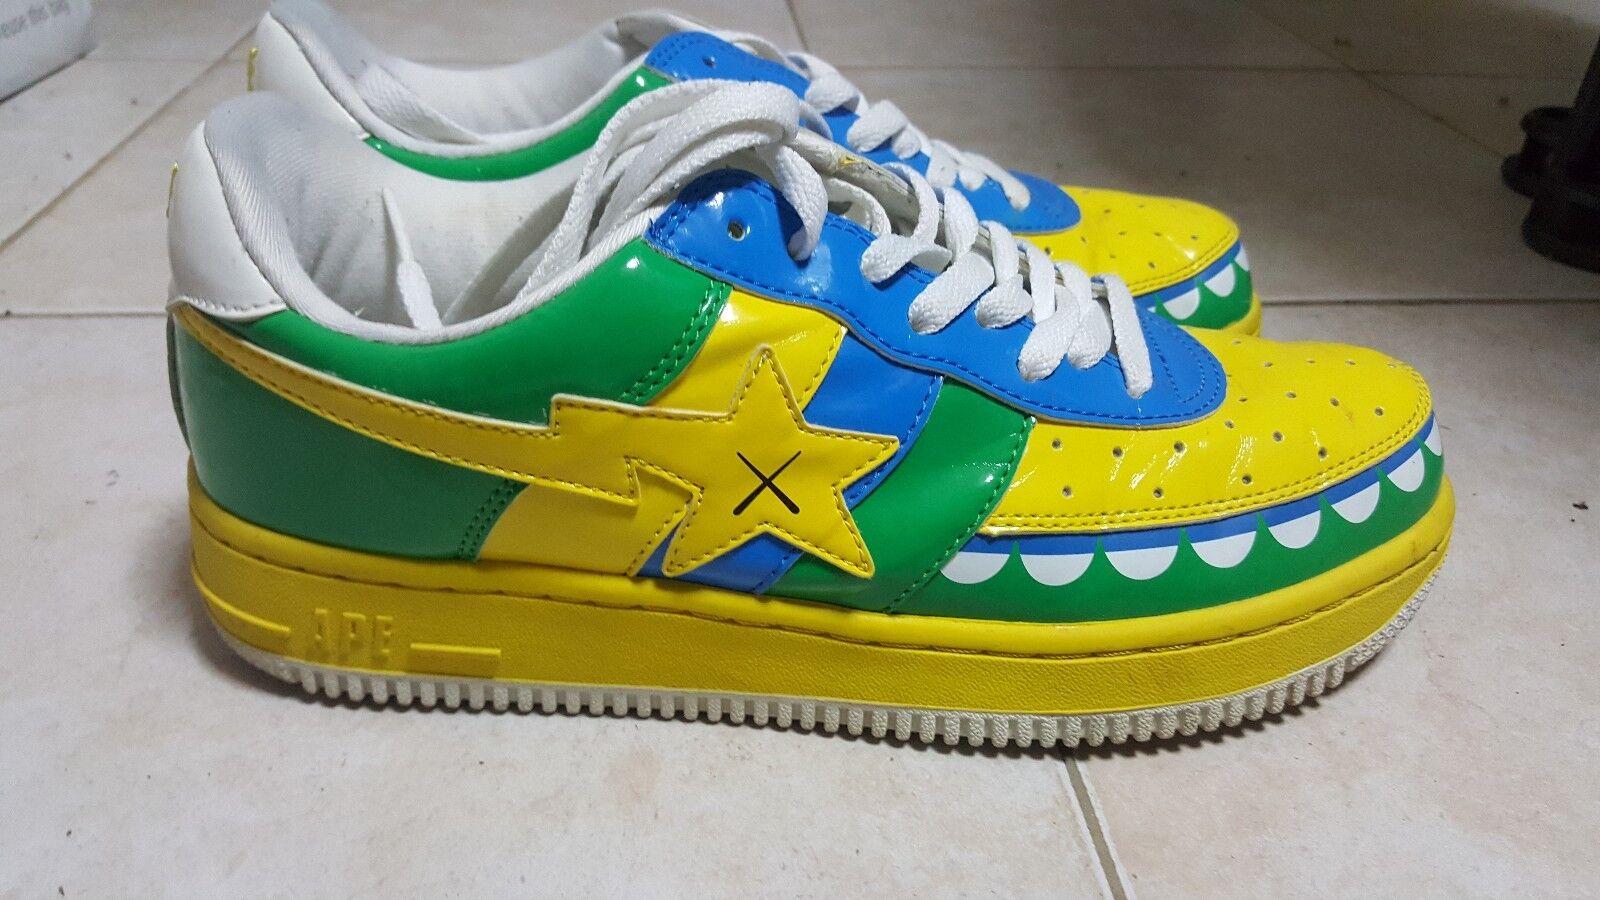 Bape Kaws Chompers Sneakers Size 9.5 Yellow Green Blue OG A Bathing Ape 2006 BOX